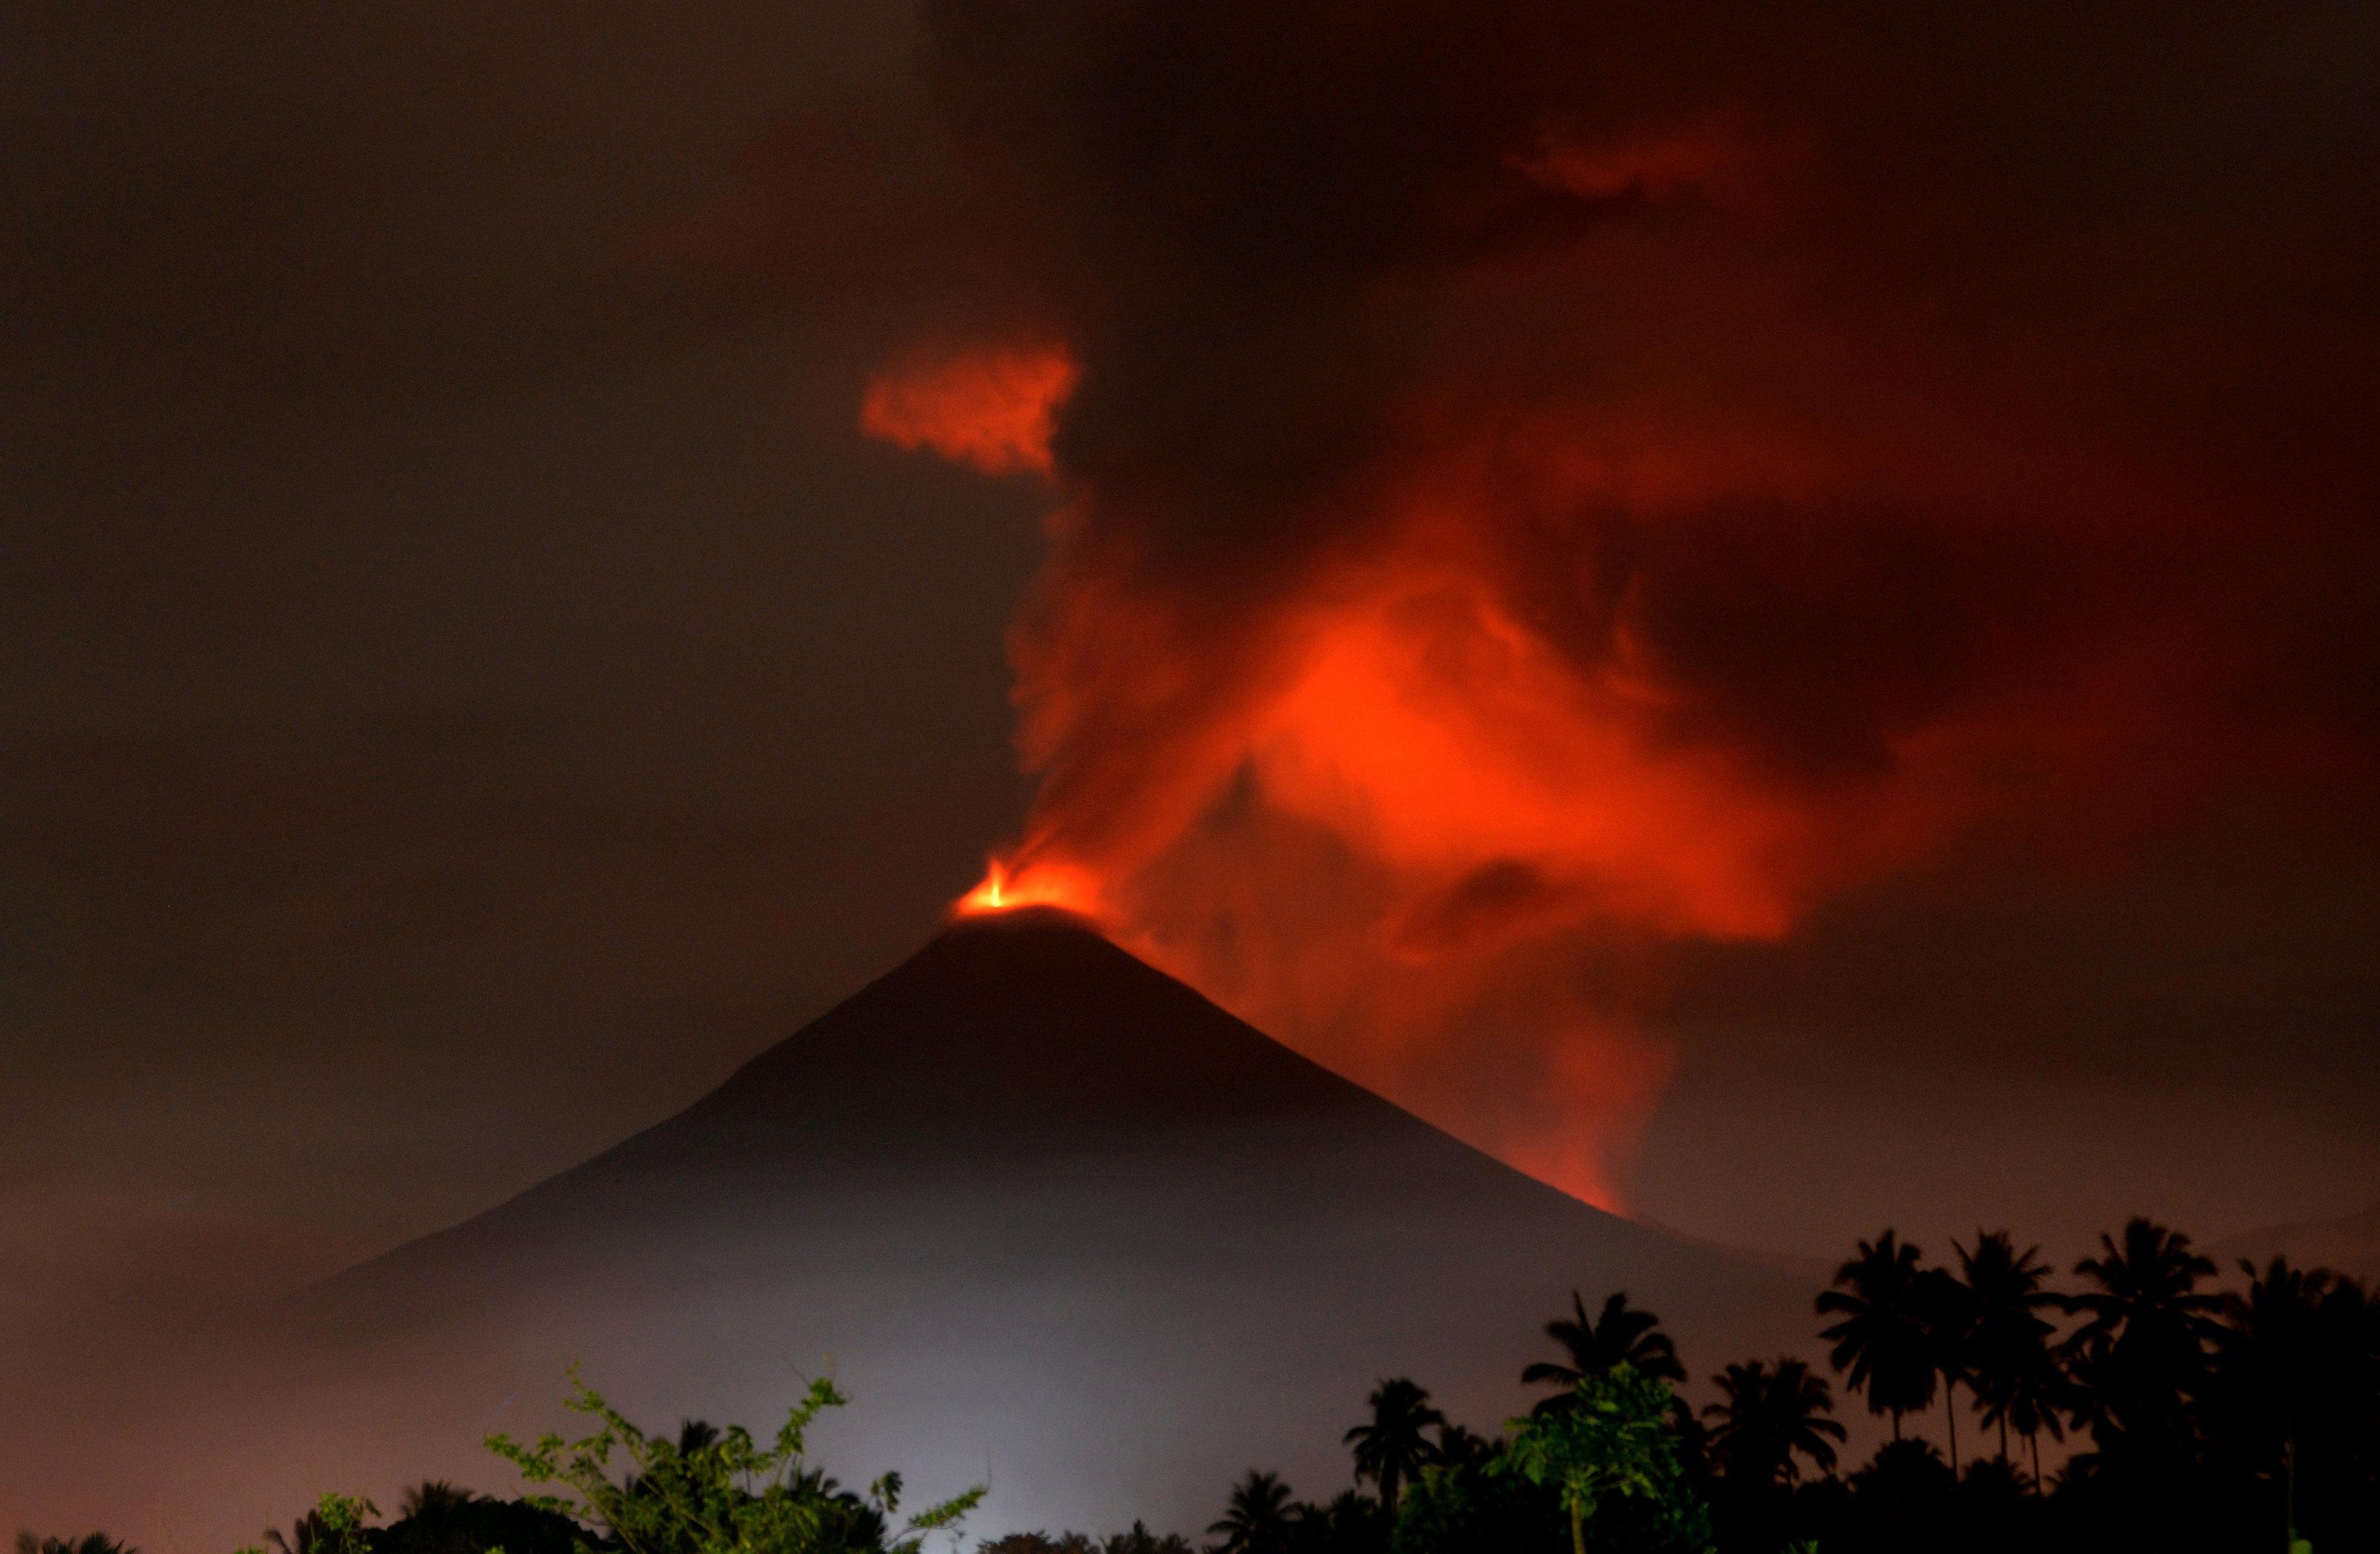 Indonesian volcano Mount Soputan erupts sending thick ash into the sky